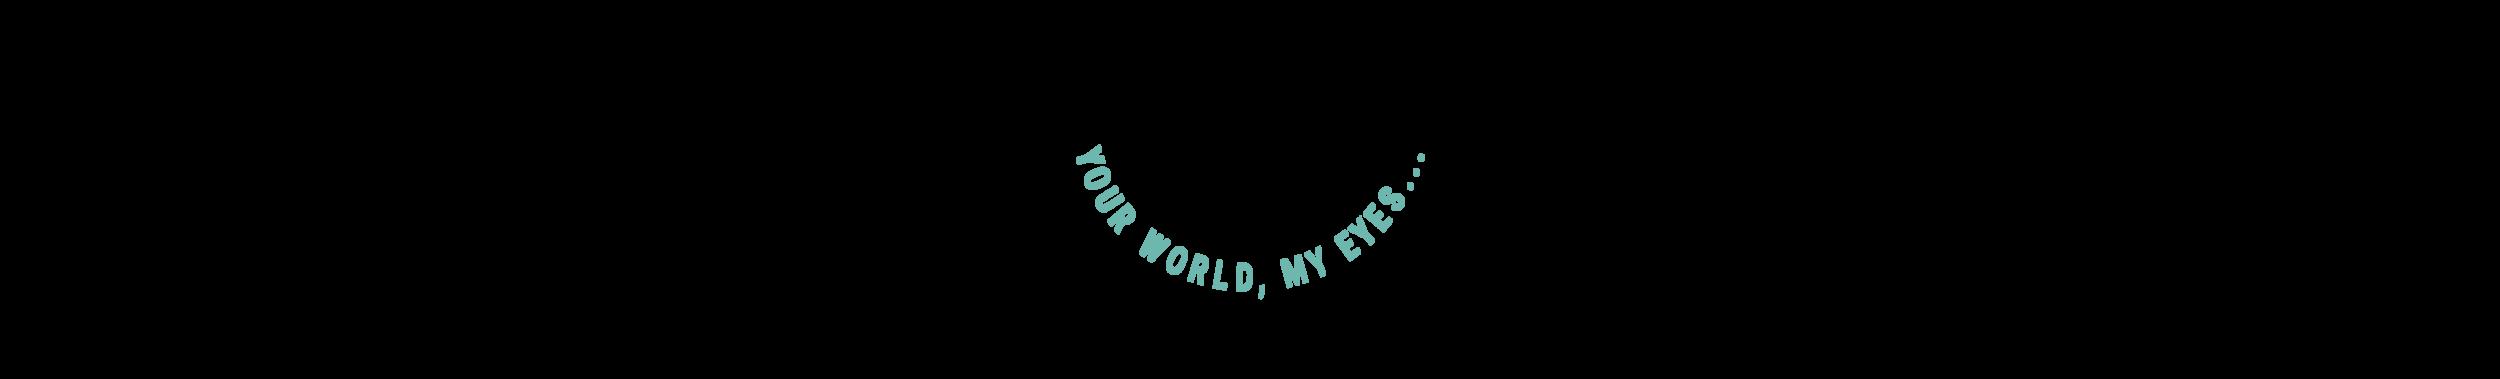 yourworldmyeyes_logodesign_R2_ywme_endstamp.png